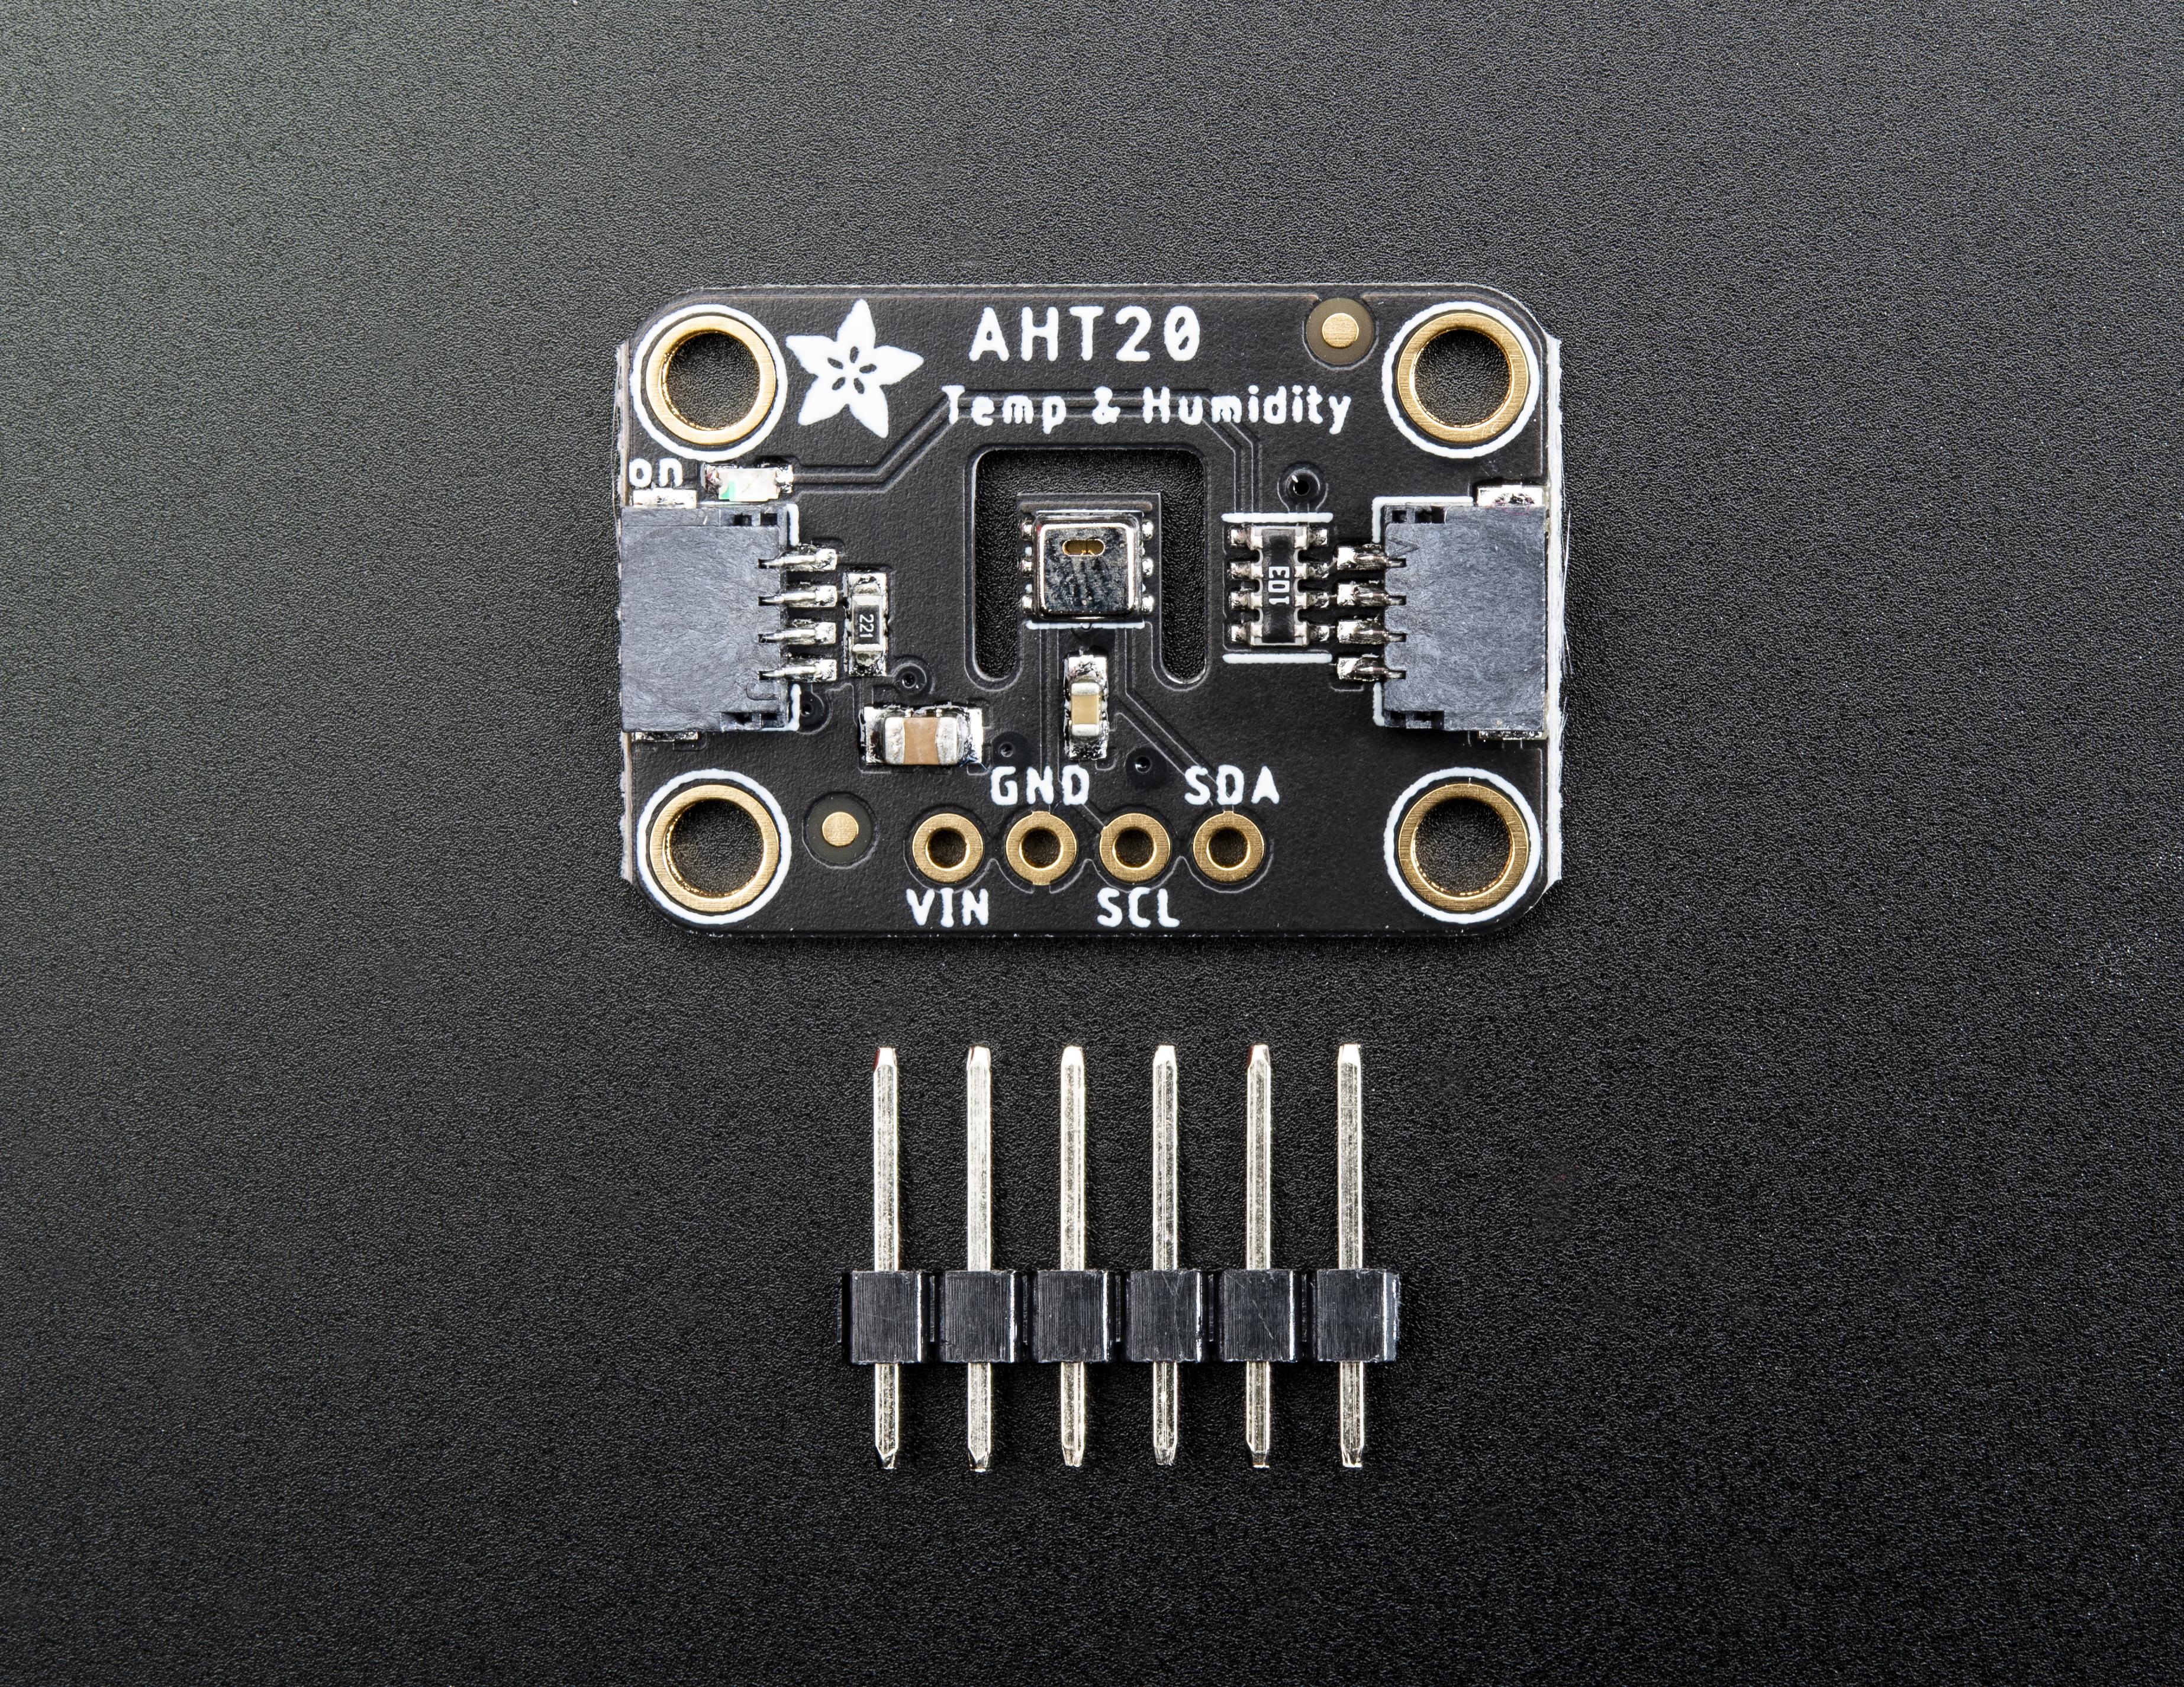 temperature___humidity_AHT20_-_prod_P4566FrontHeader.jpg